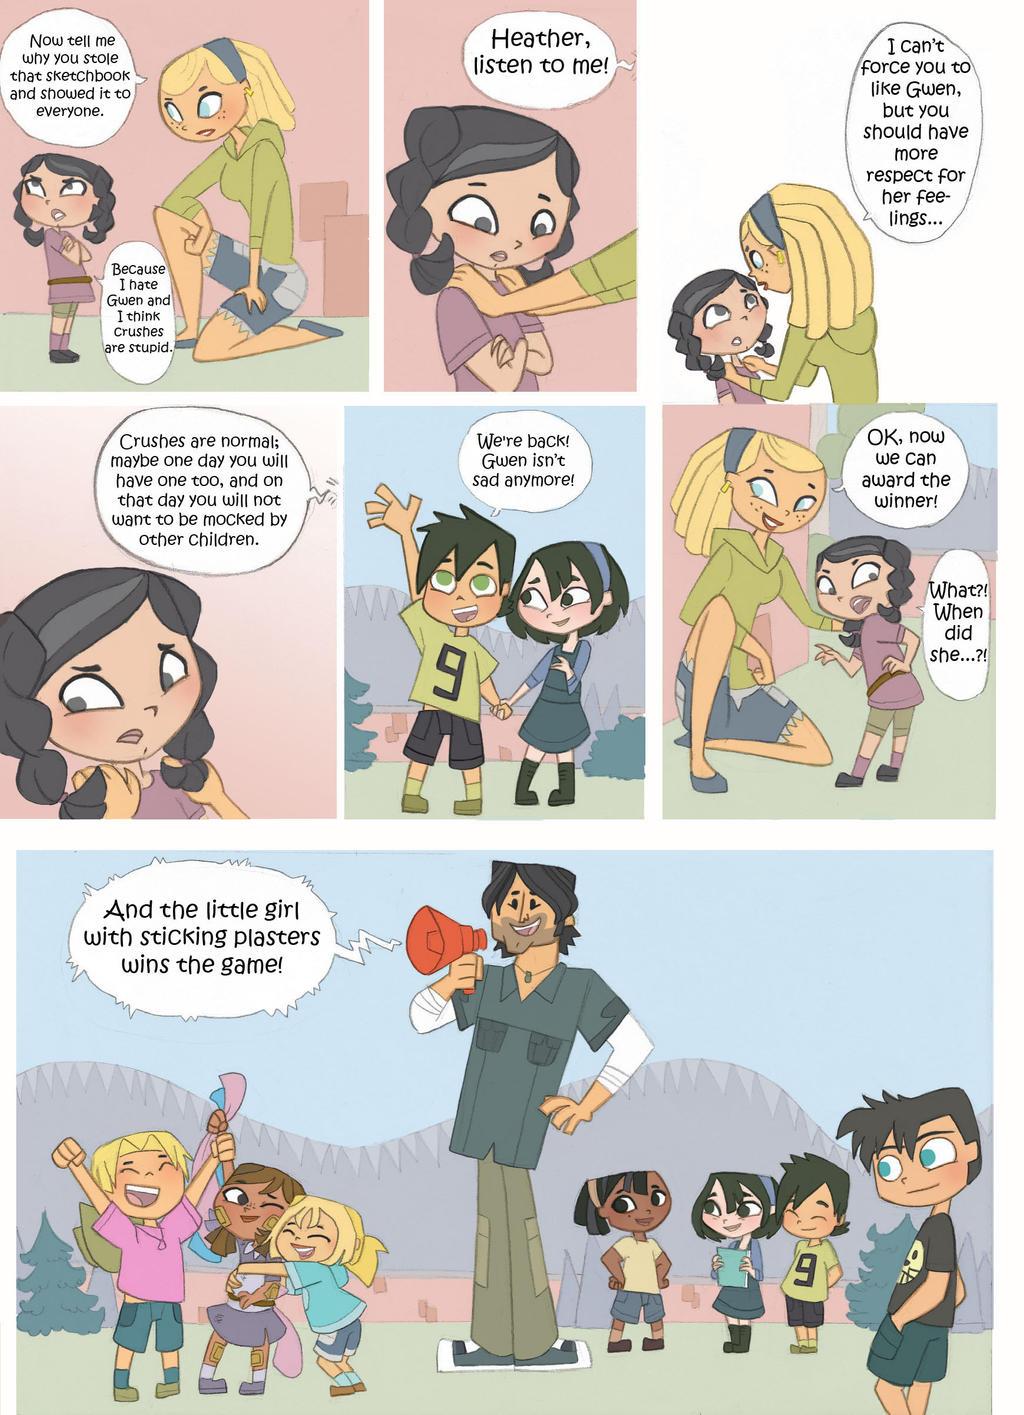 Total drama kids comic pag 12 by Kikaigaku on DeviantArt